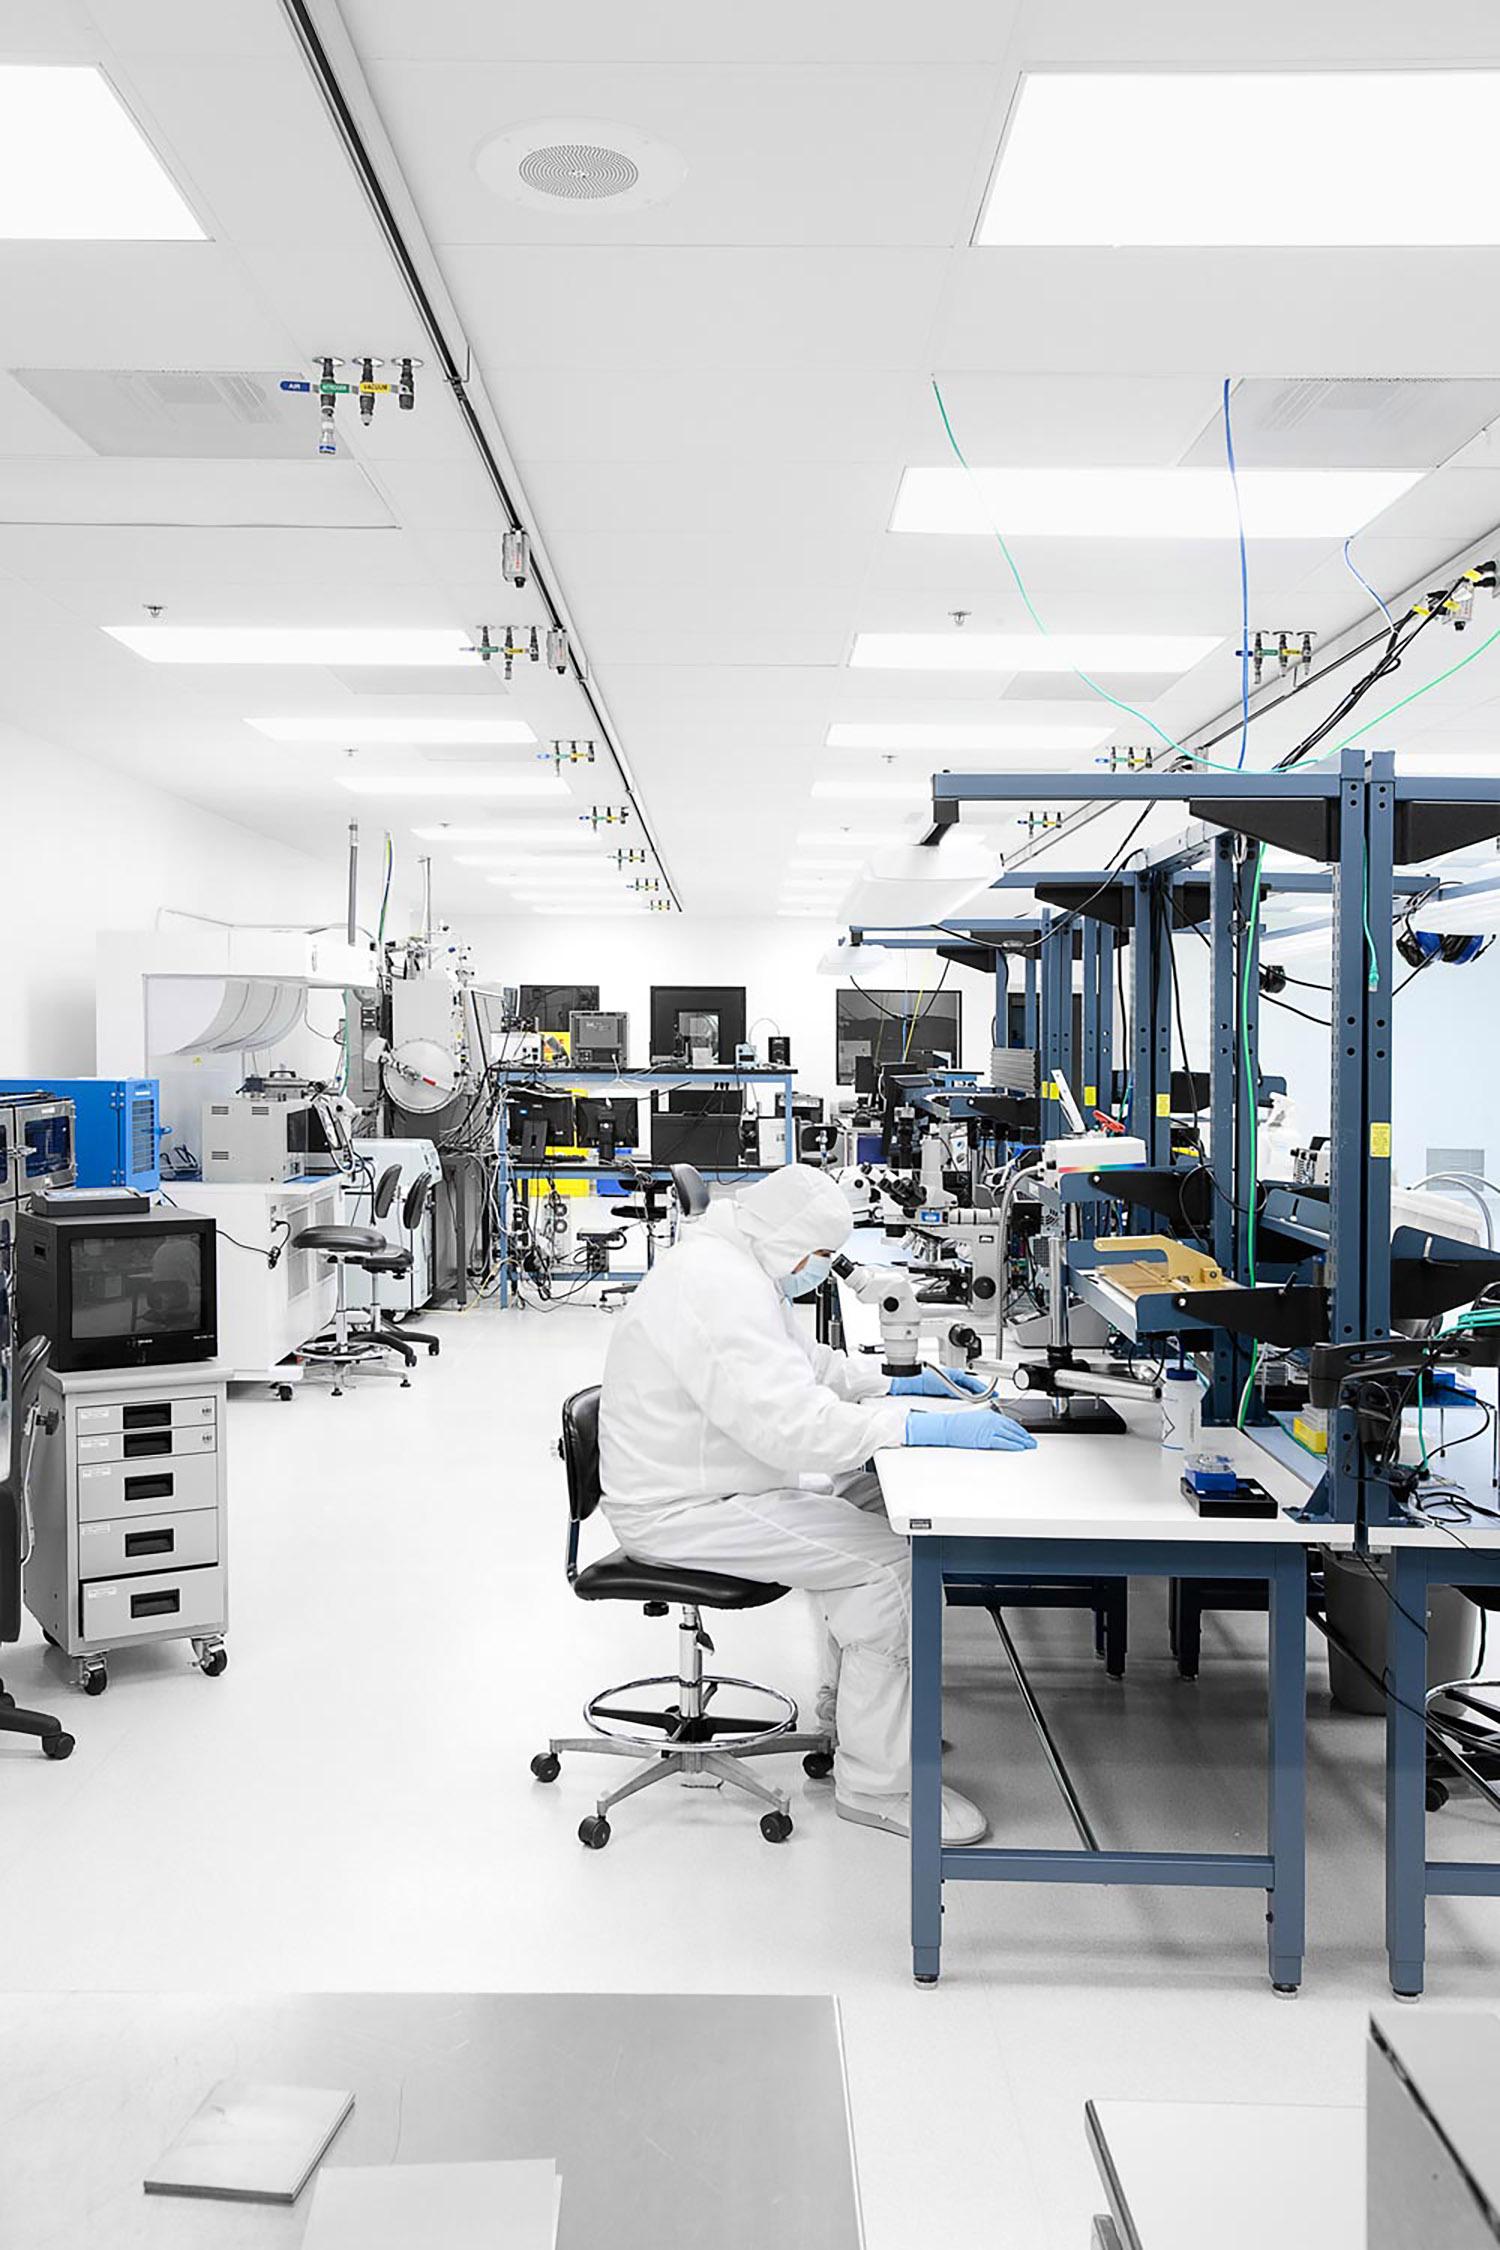 Argus II Retinal Implant Lab, Second Sight, Sylmar, California, 2010